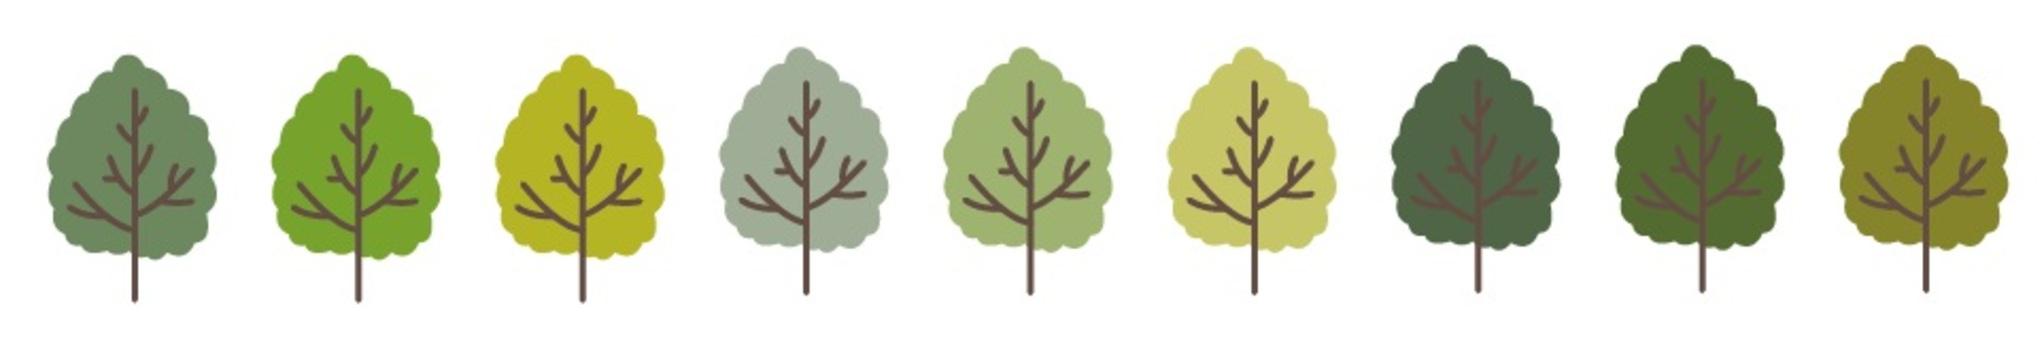 Line of handwritten trees